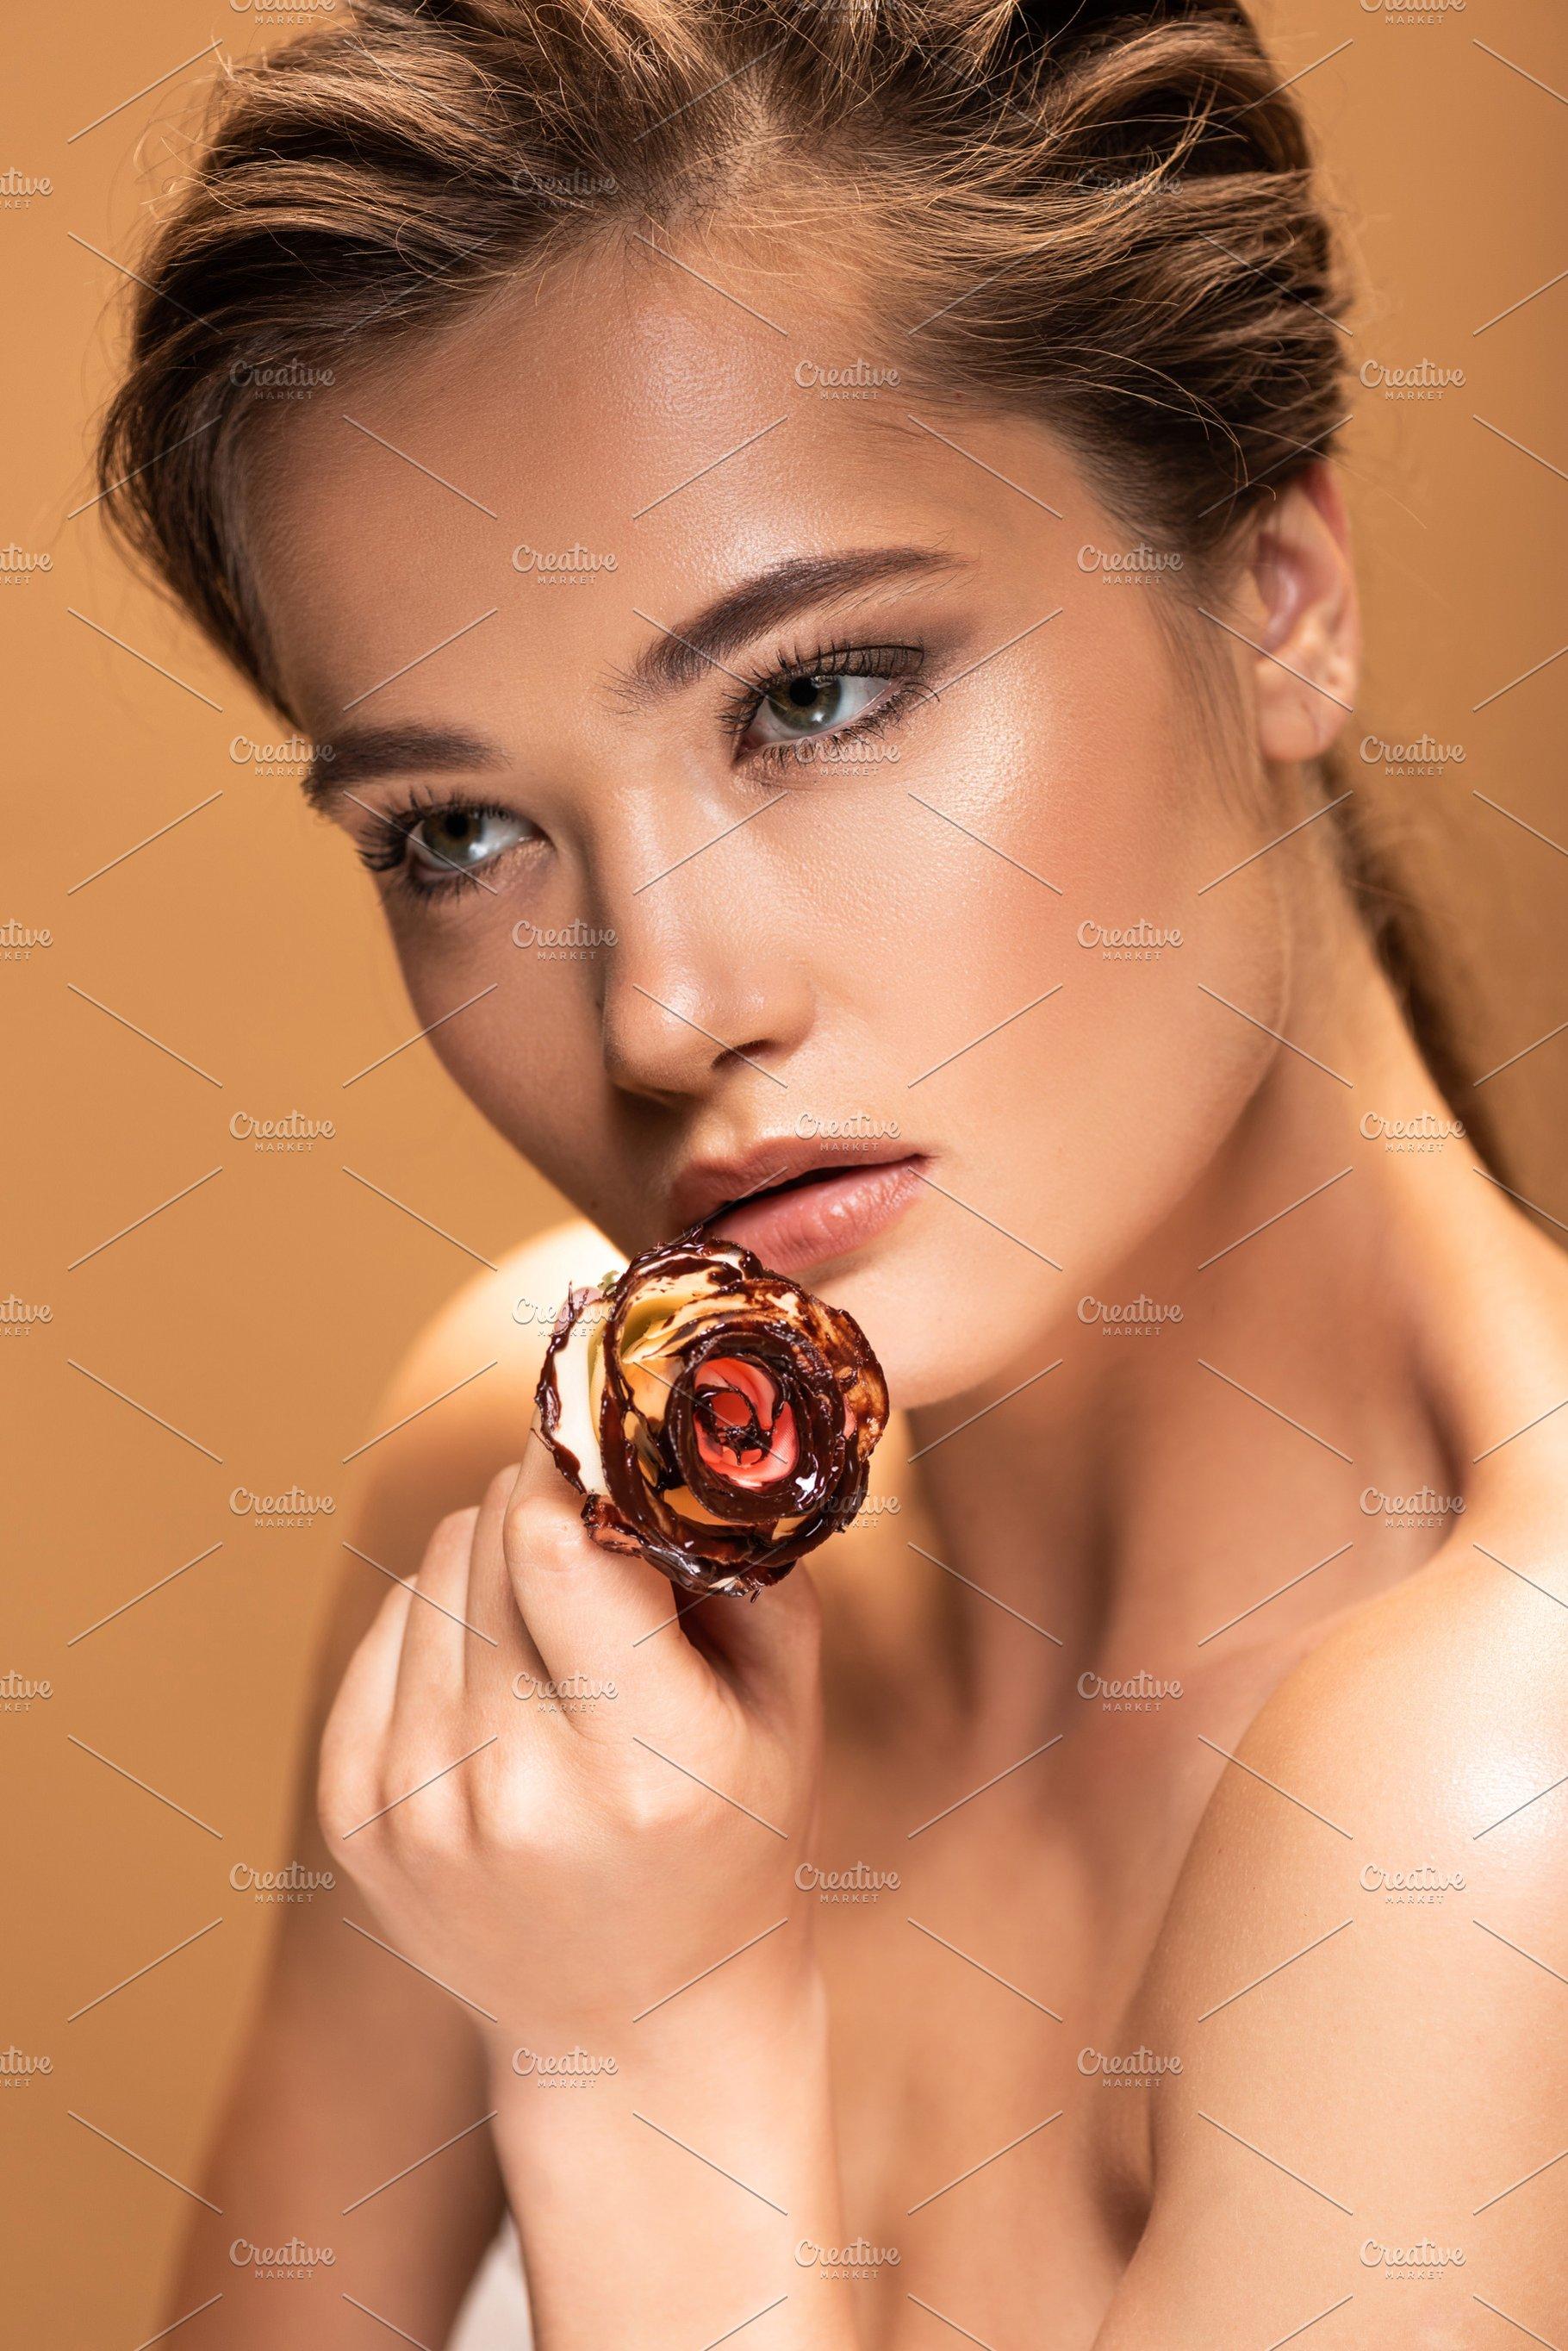 Photo nude irani girl